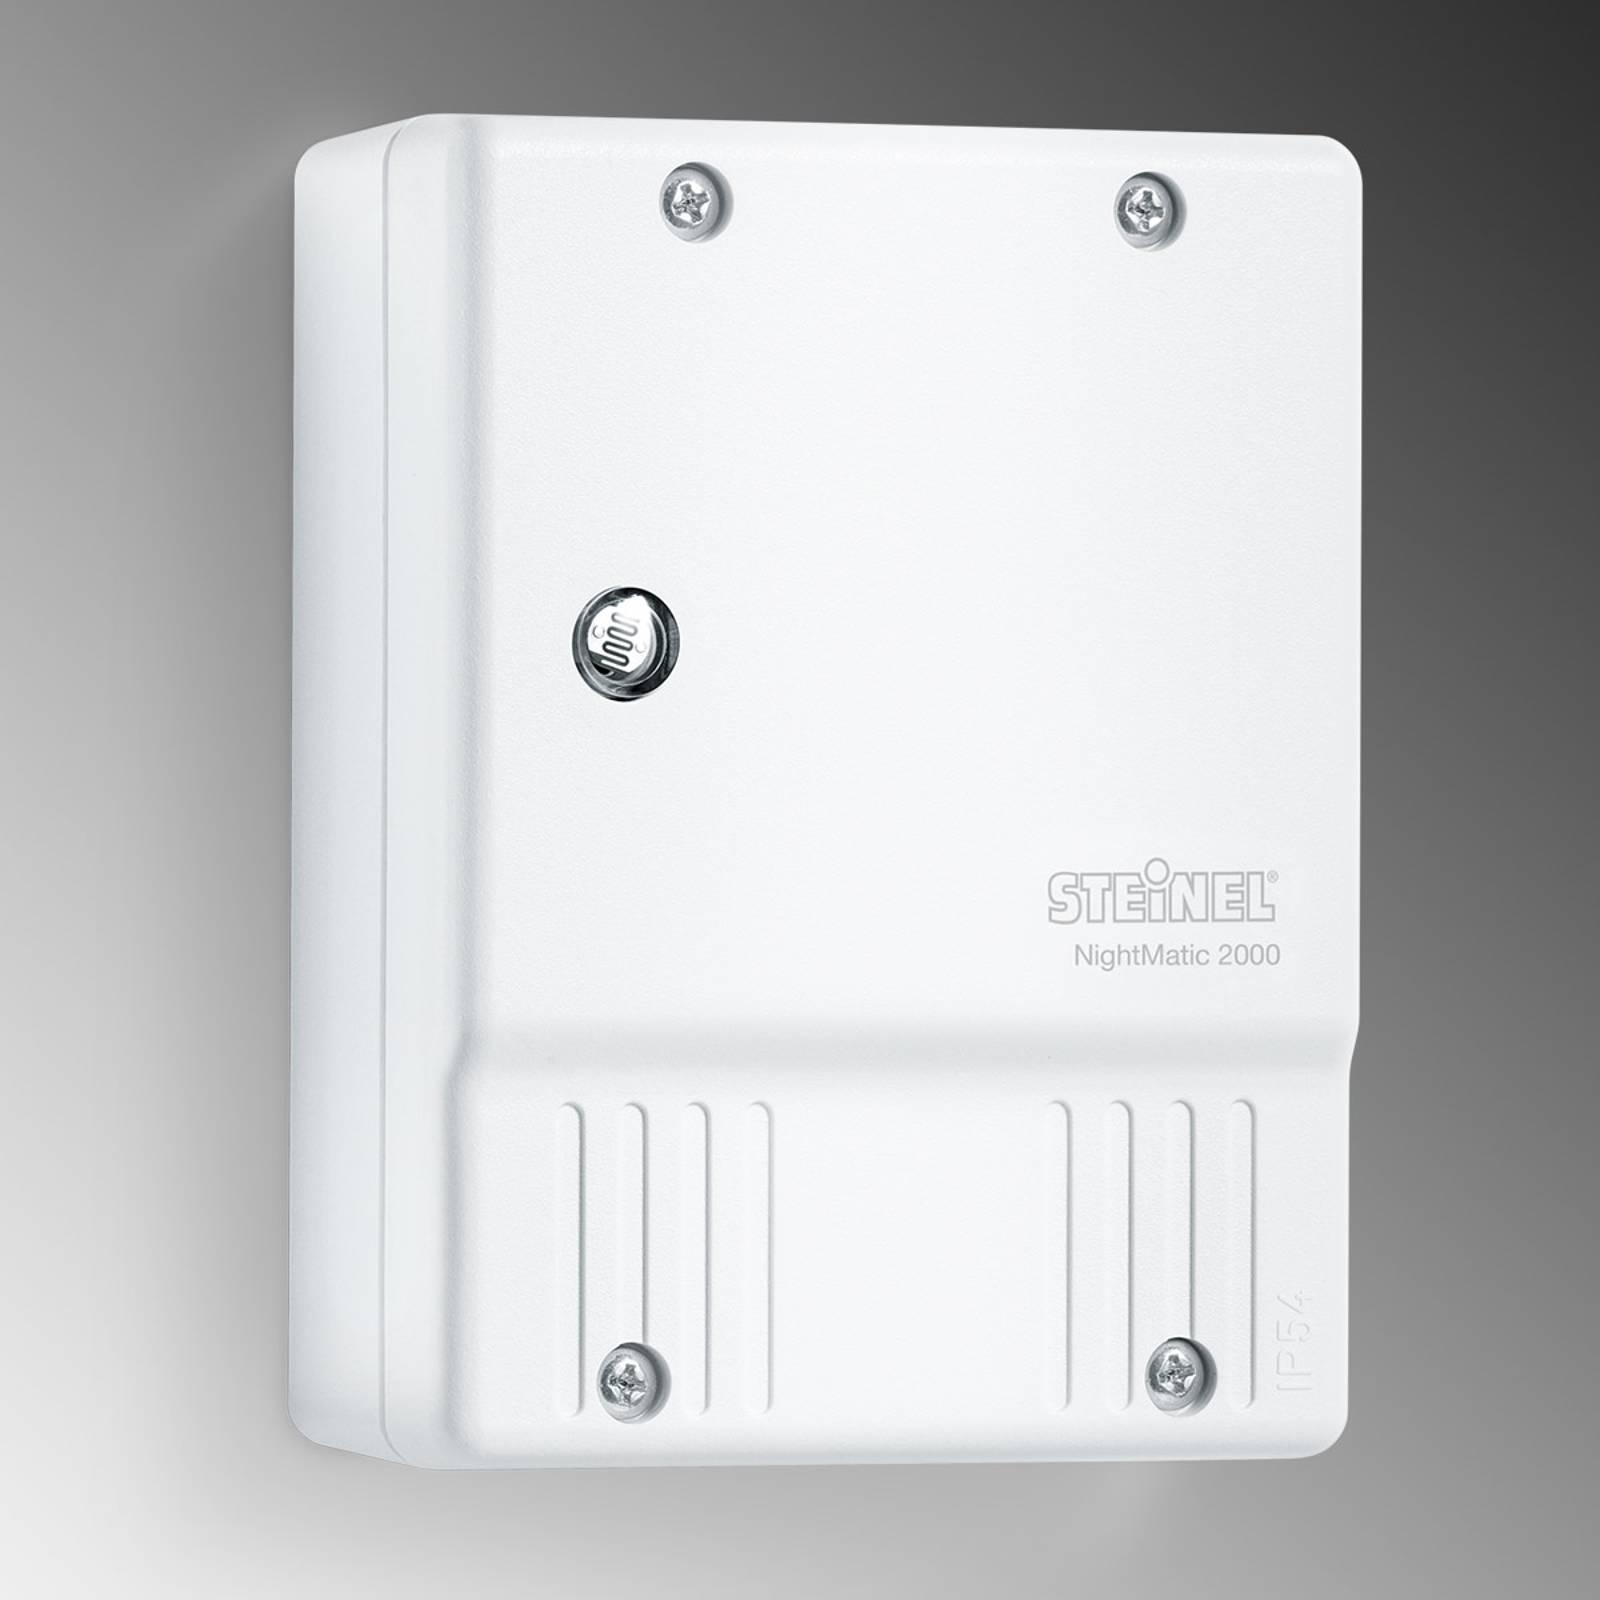 STEINEL Nightmatic 2000 crepuscolare, bianco